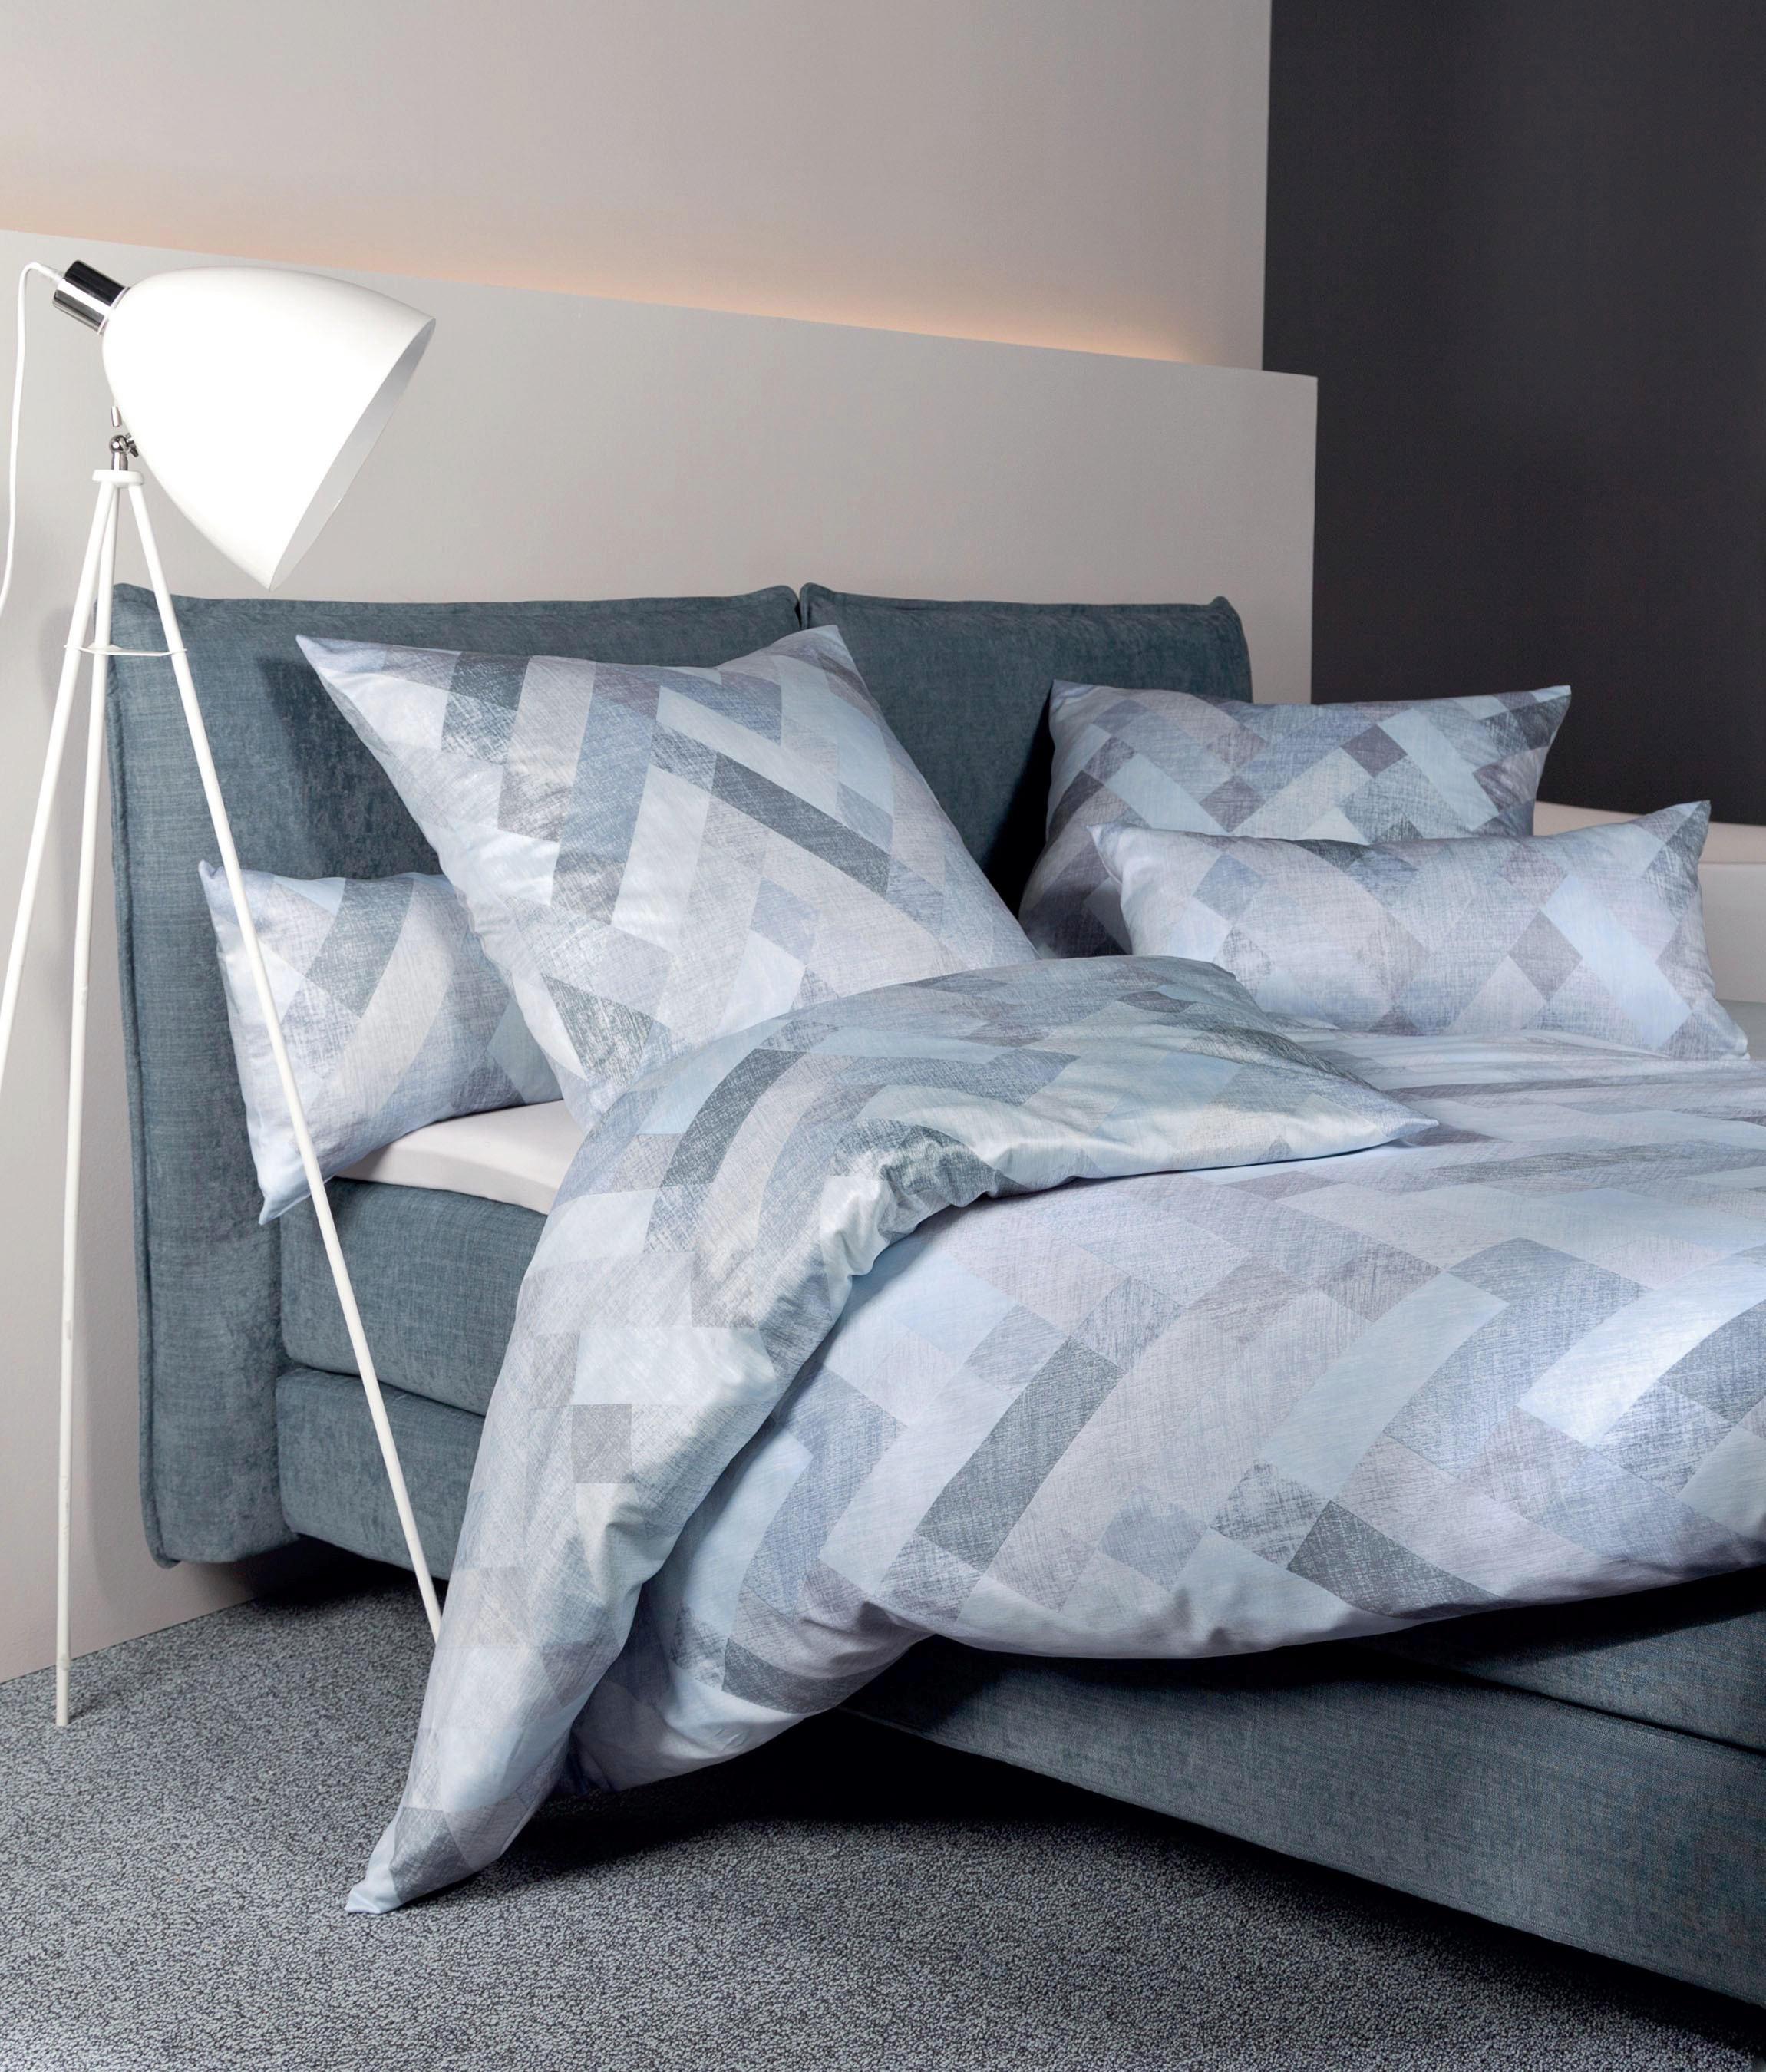 BETTWÄSCHE Interlock-Jersey Hellblau 155/220 cm - Hellblau, Textil (155/220cm) - JANINE